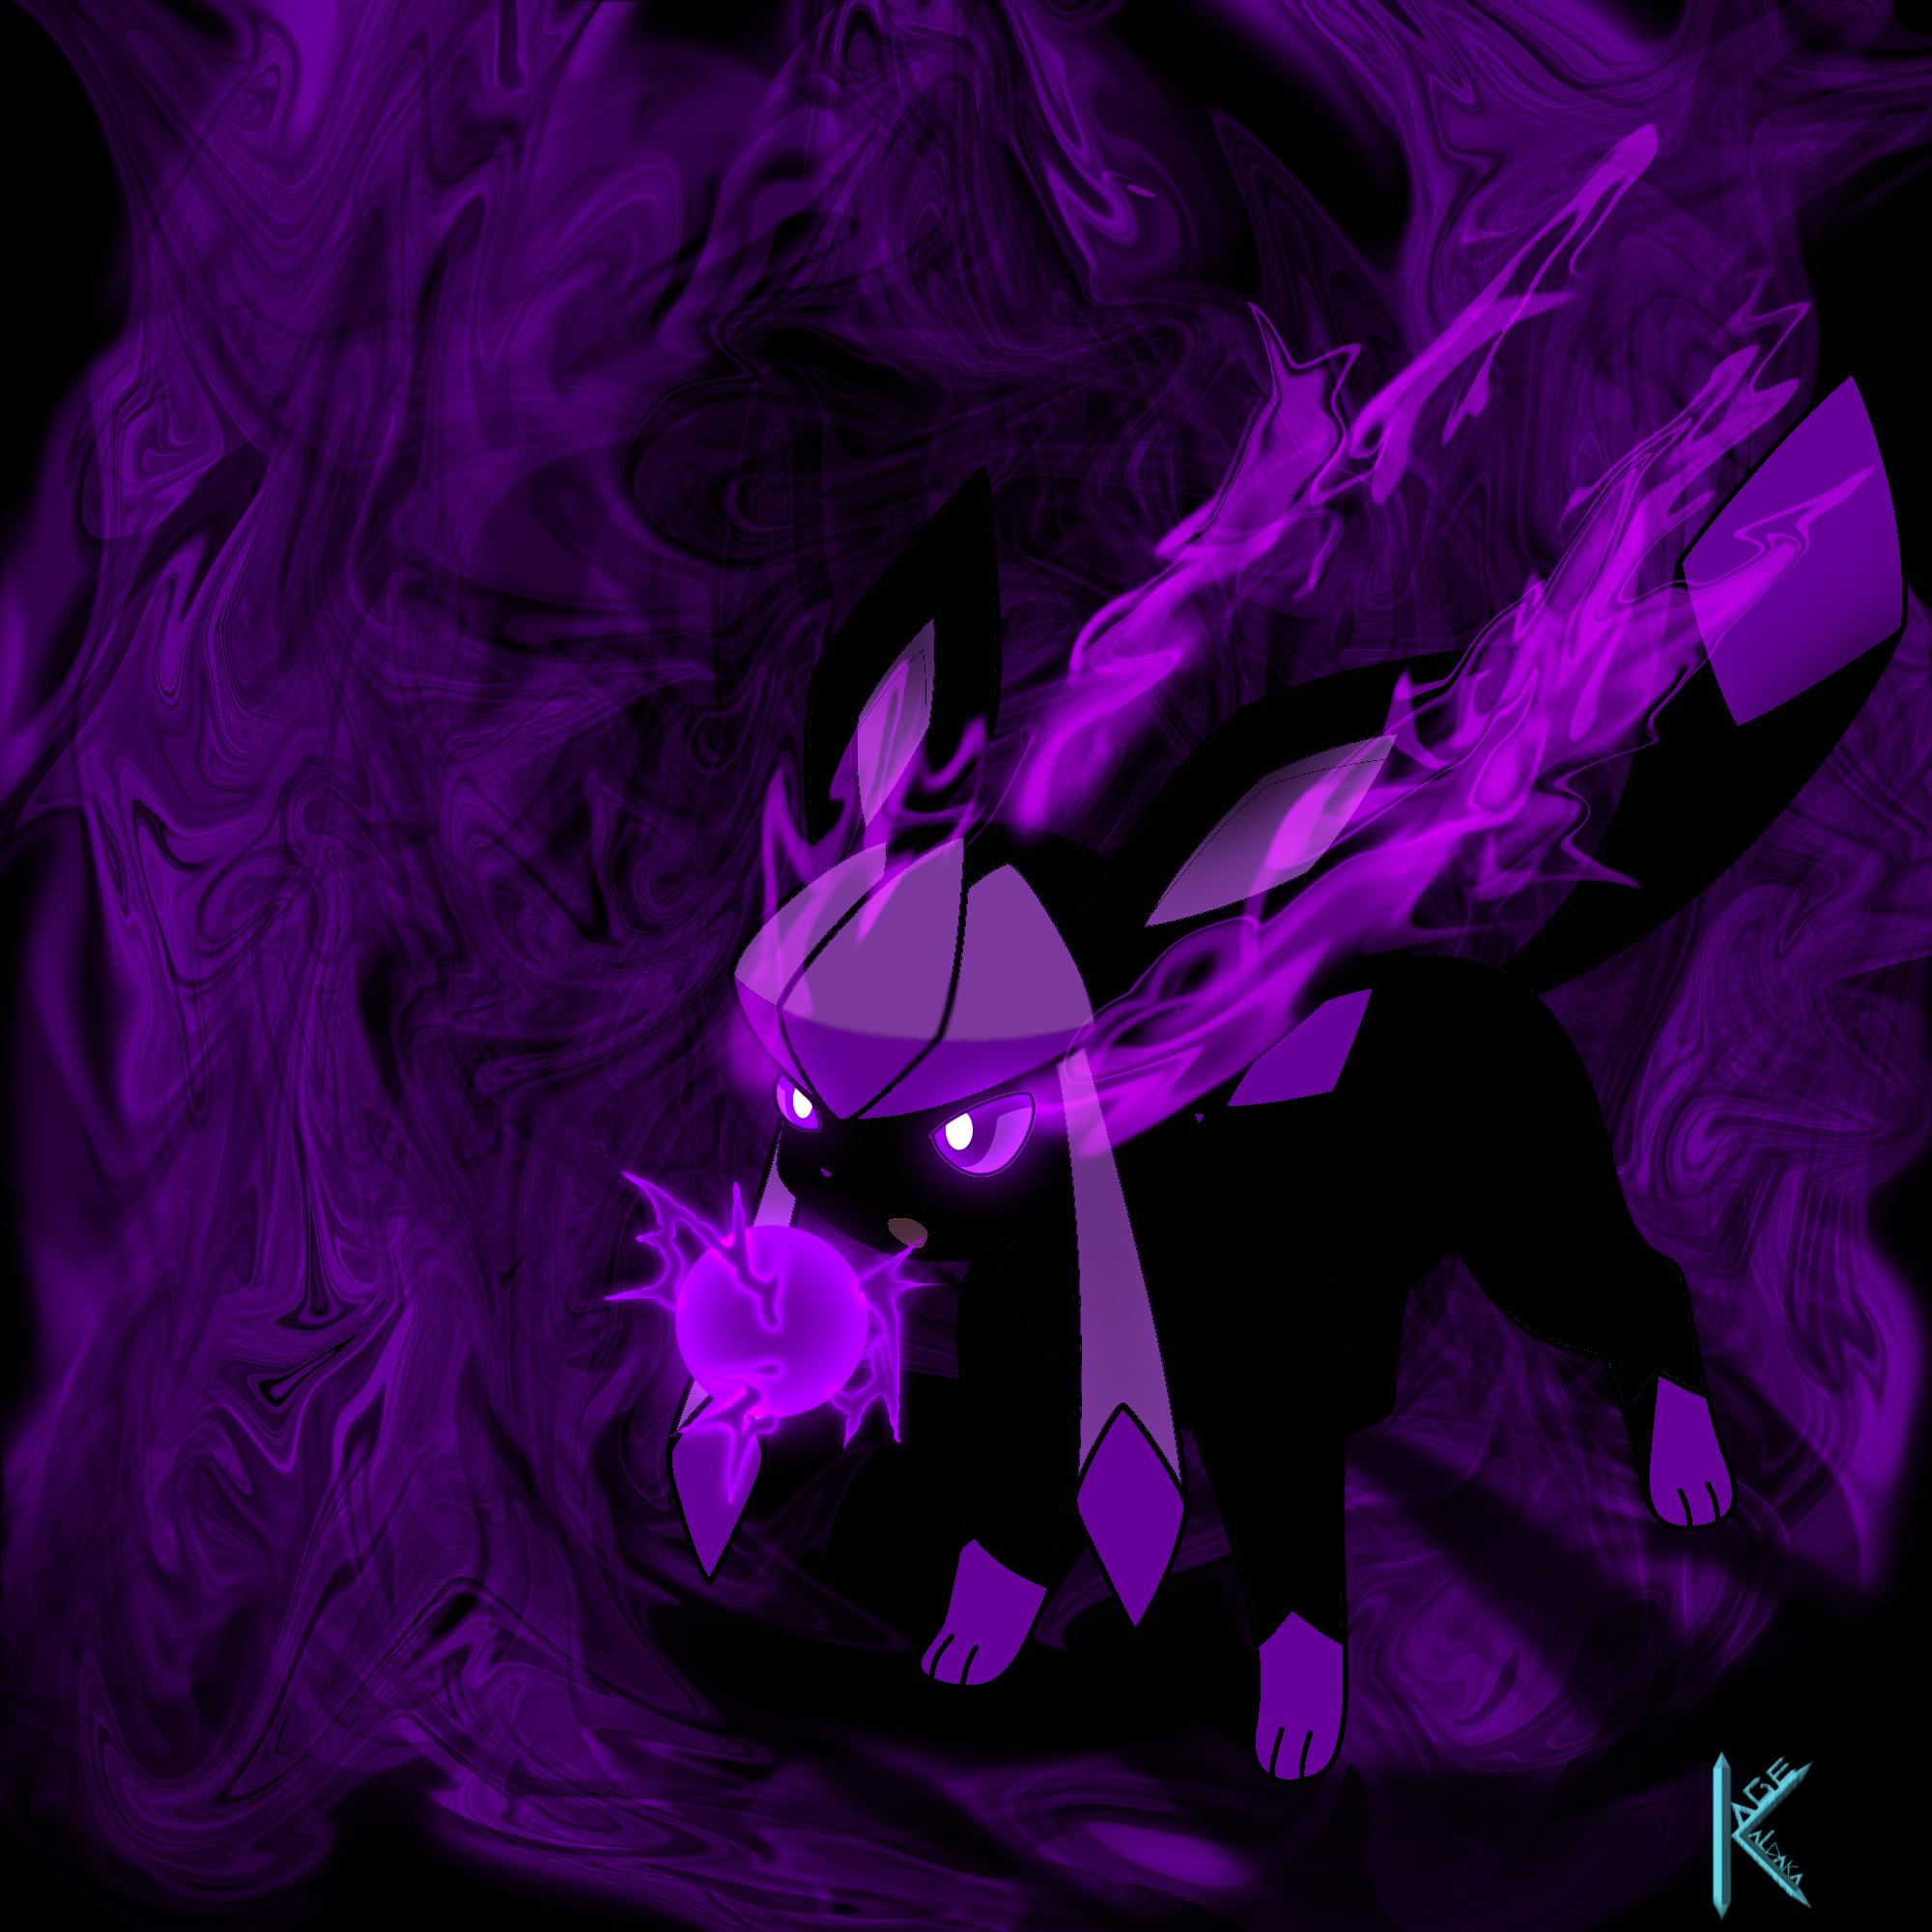 Kage Kaldaka (The Character) as a Glaceon by Kage-Kaldaka